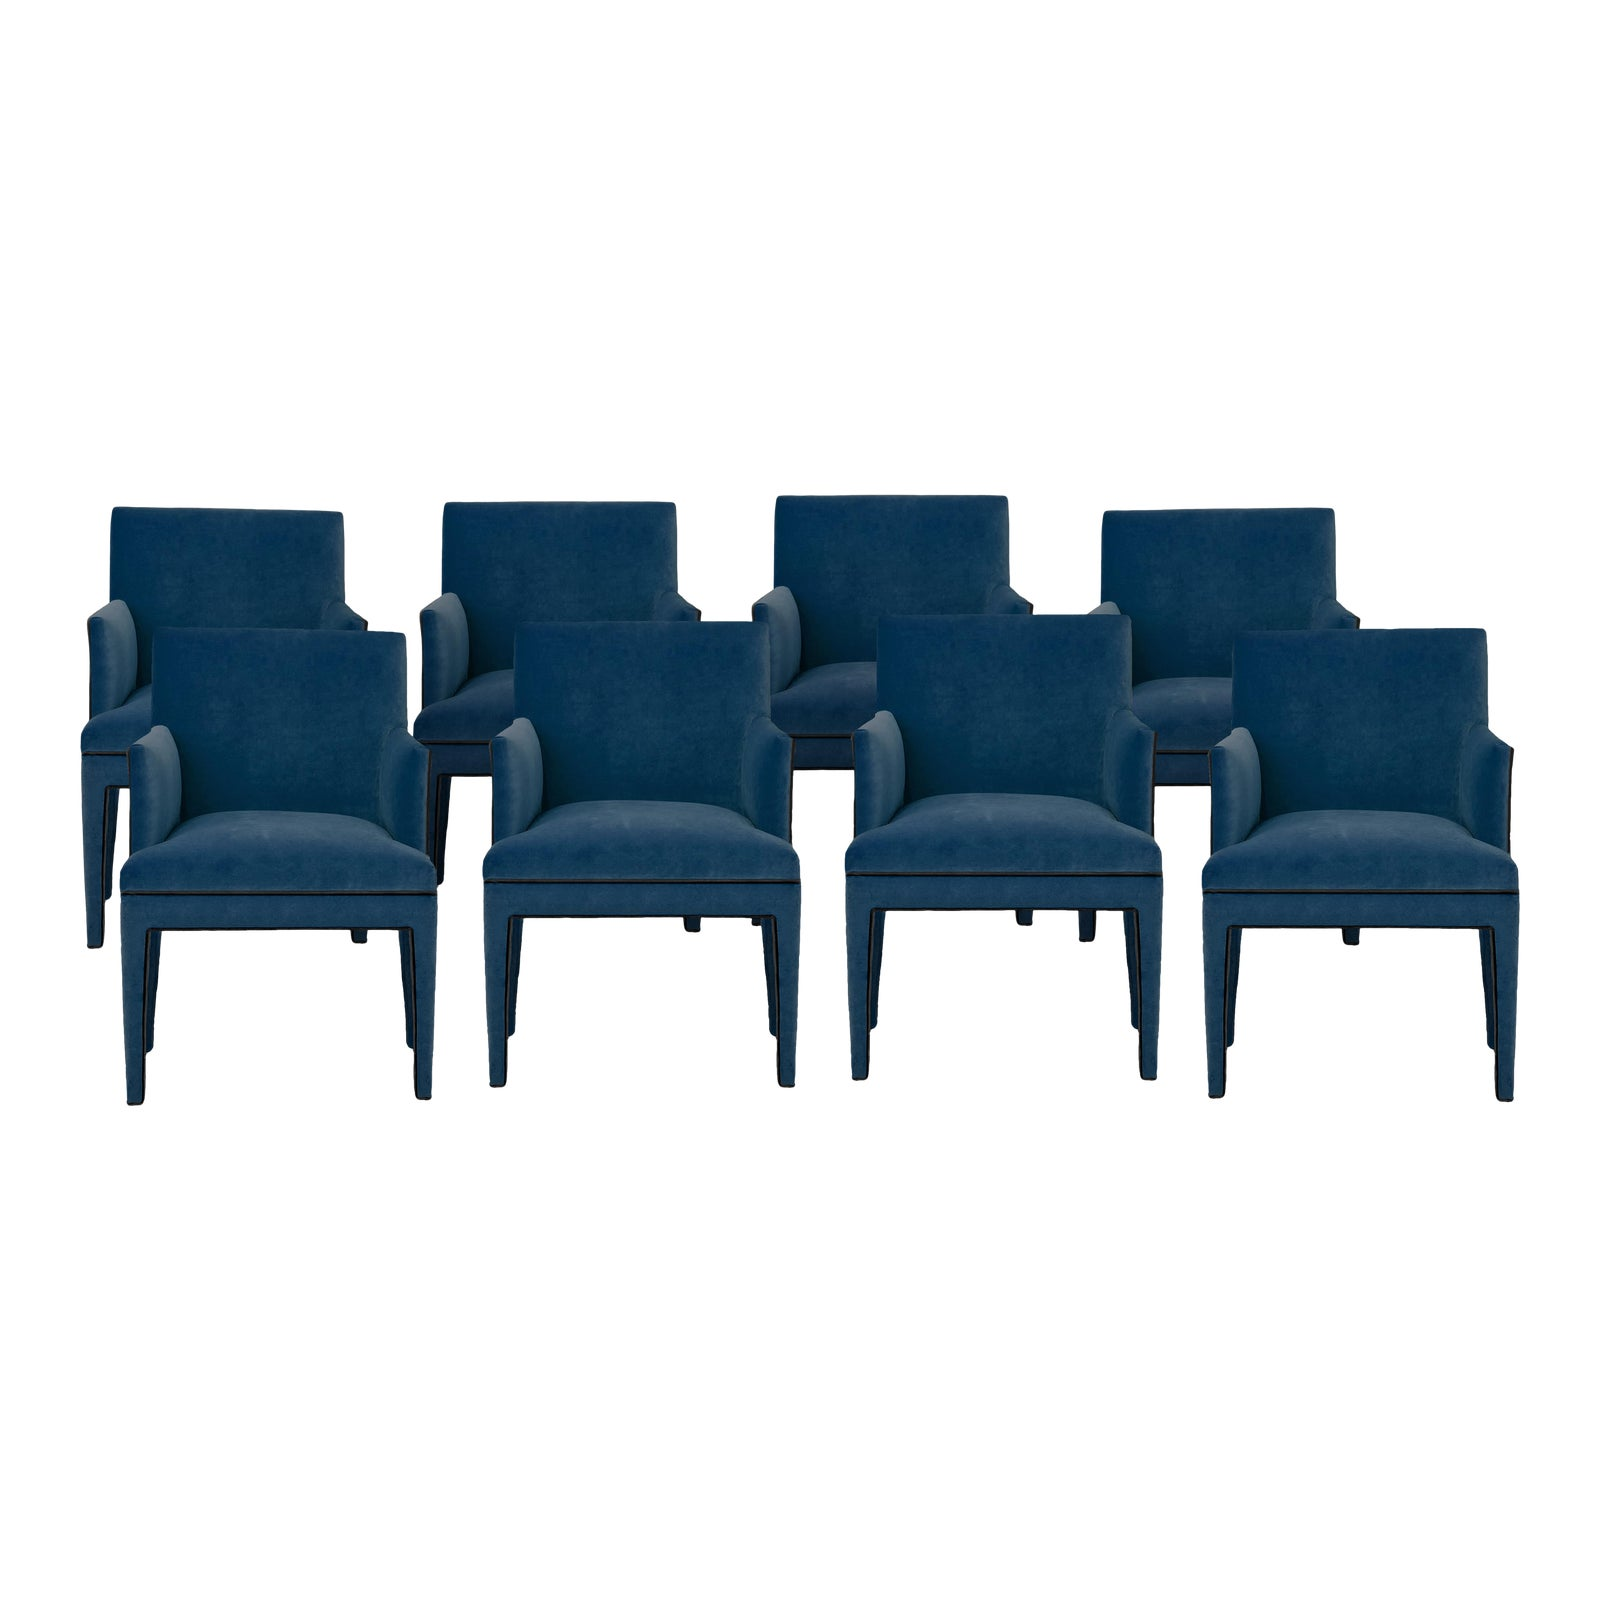 Upholstered Dining Armchair In Royal Velvet Black Piping Set Of 8 Chairish